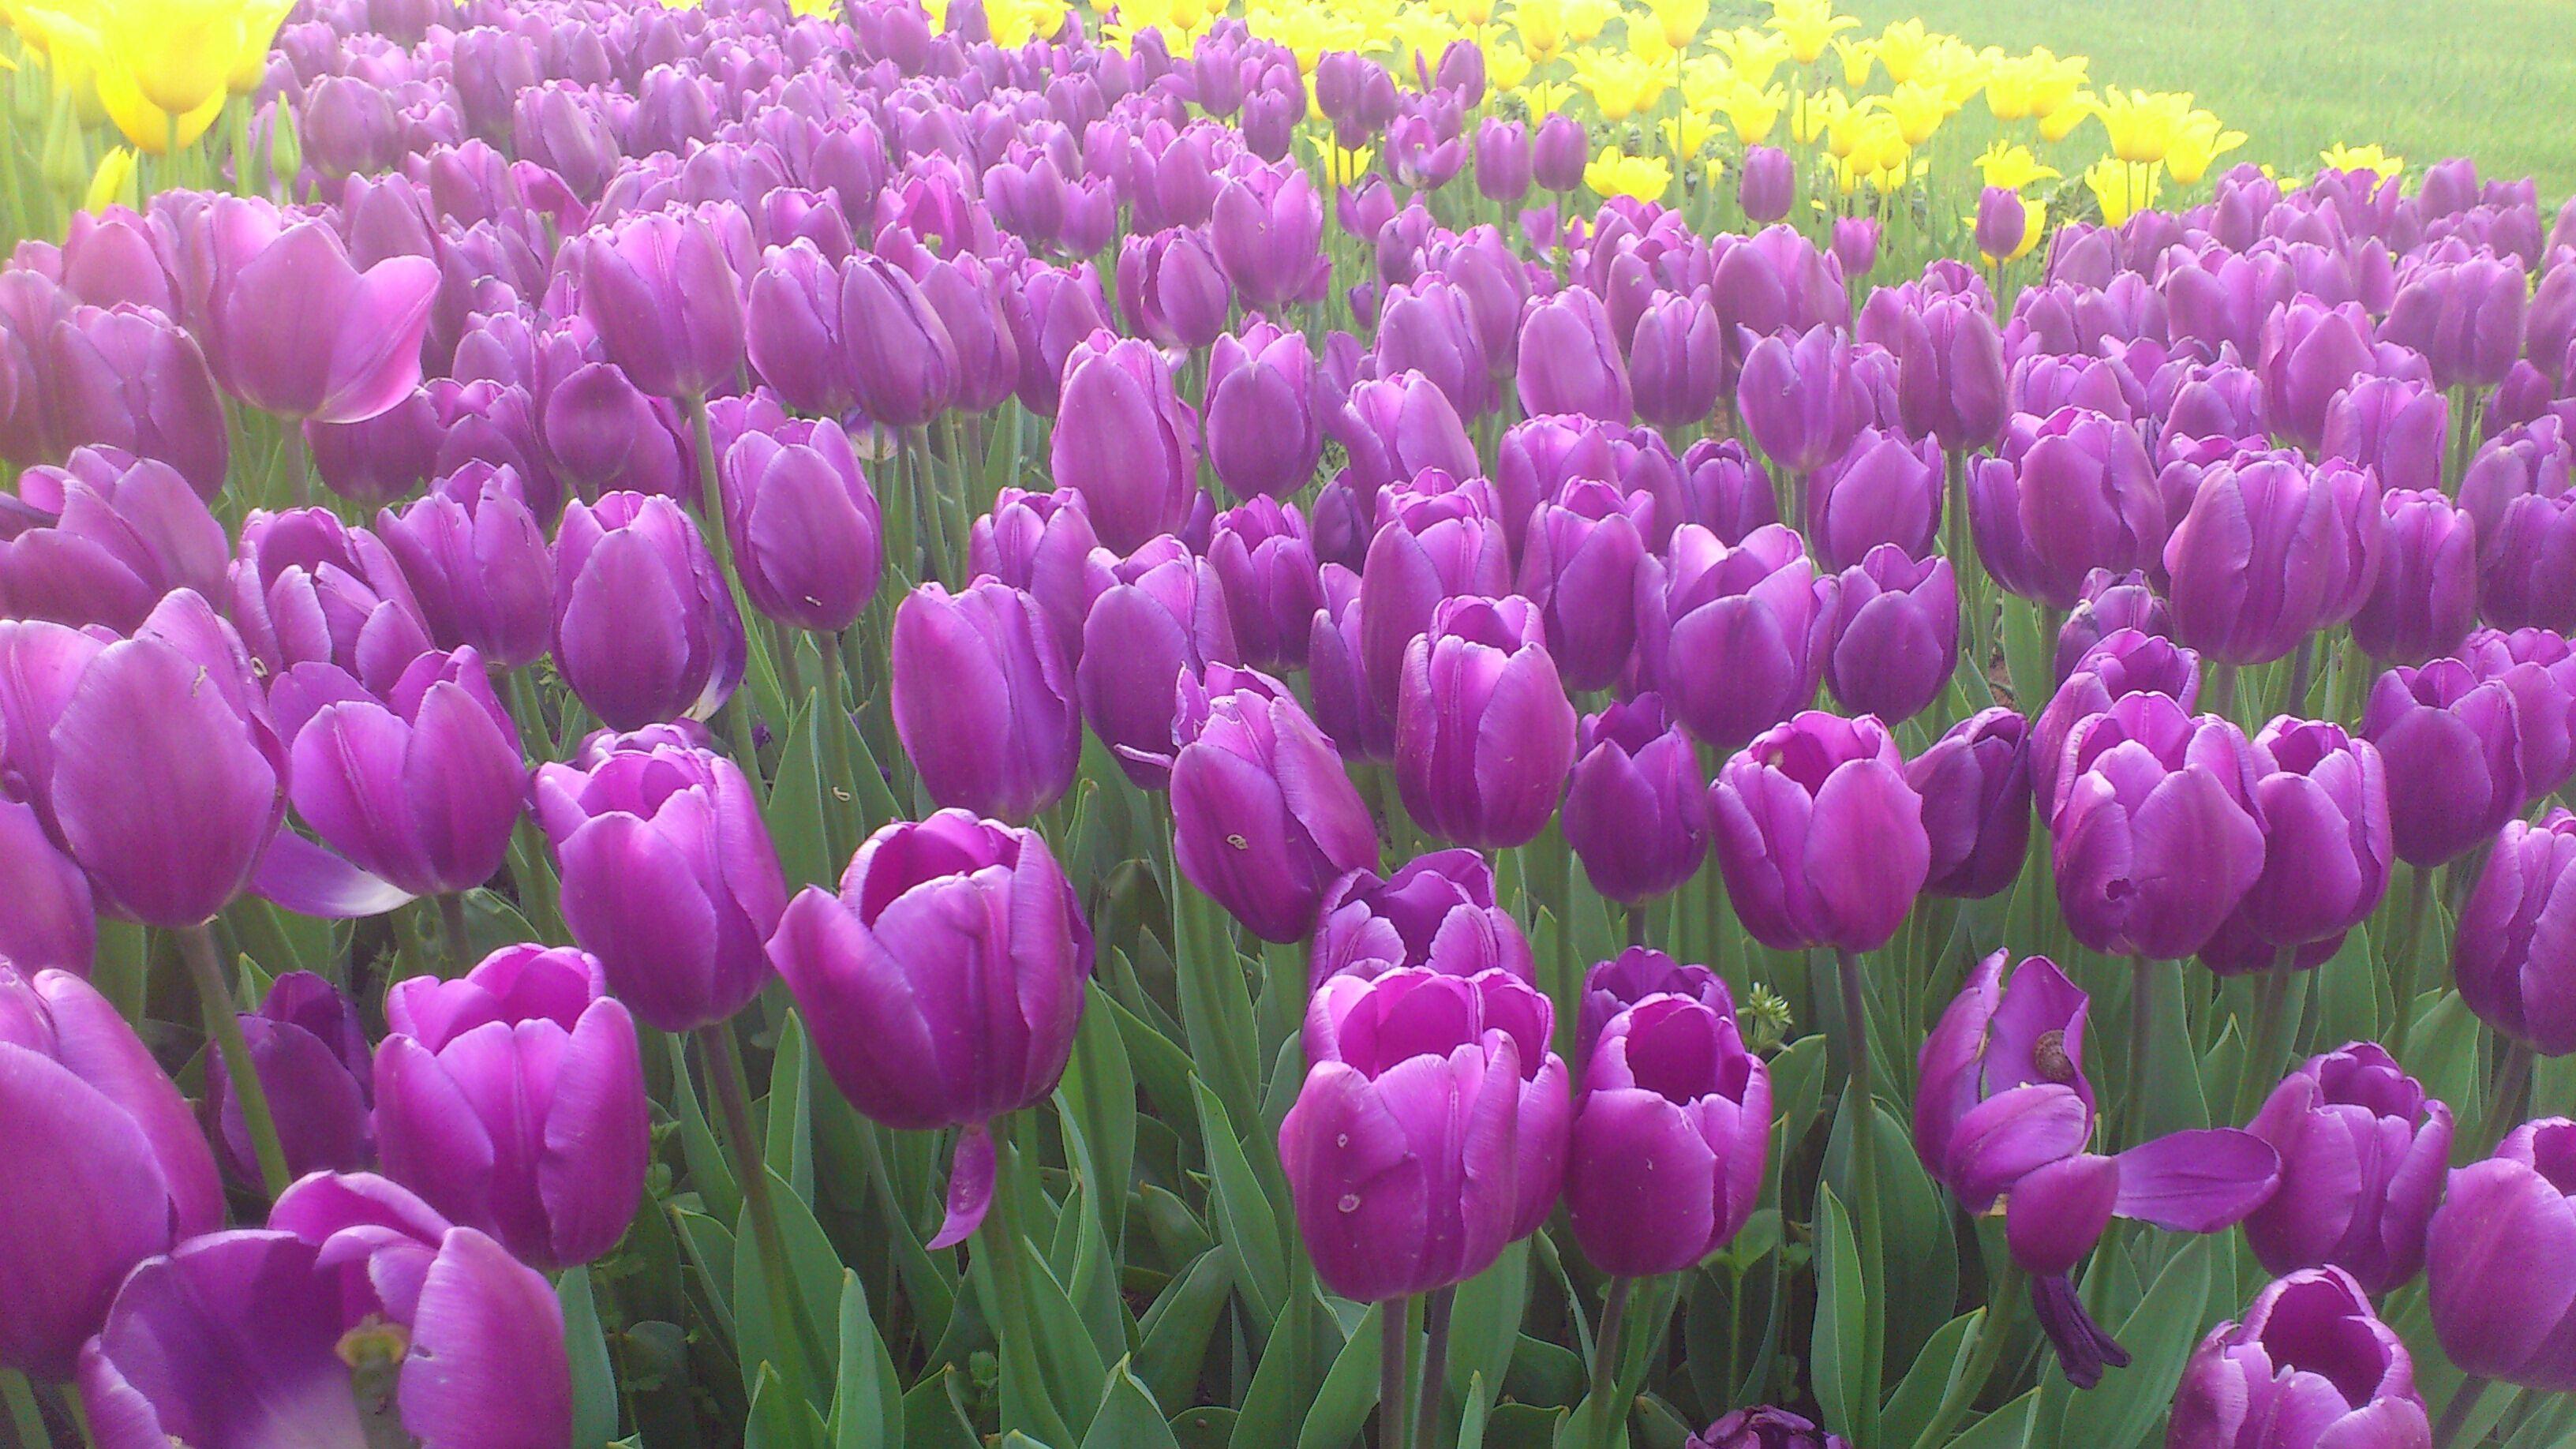 Purple lilies flowers pinterest purple lily flowers and plants purple lilies izmirmasajfo